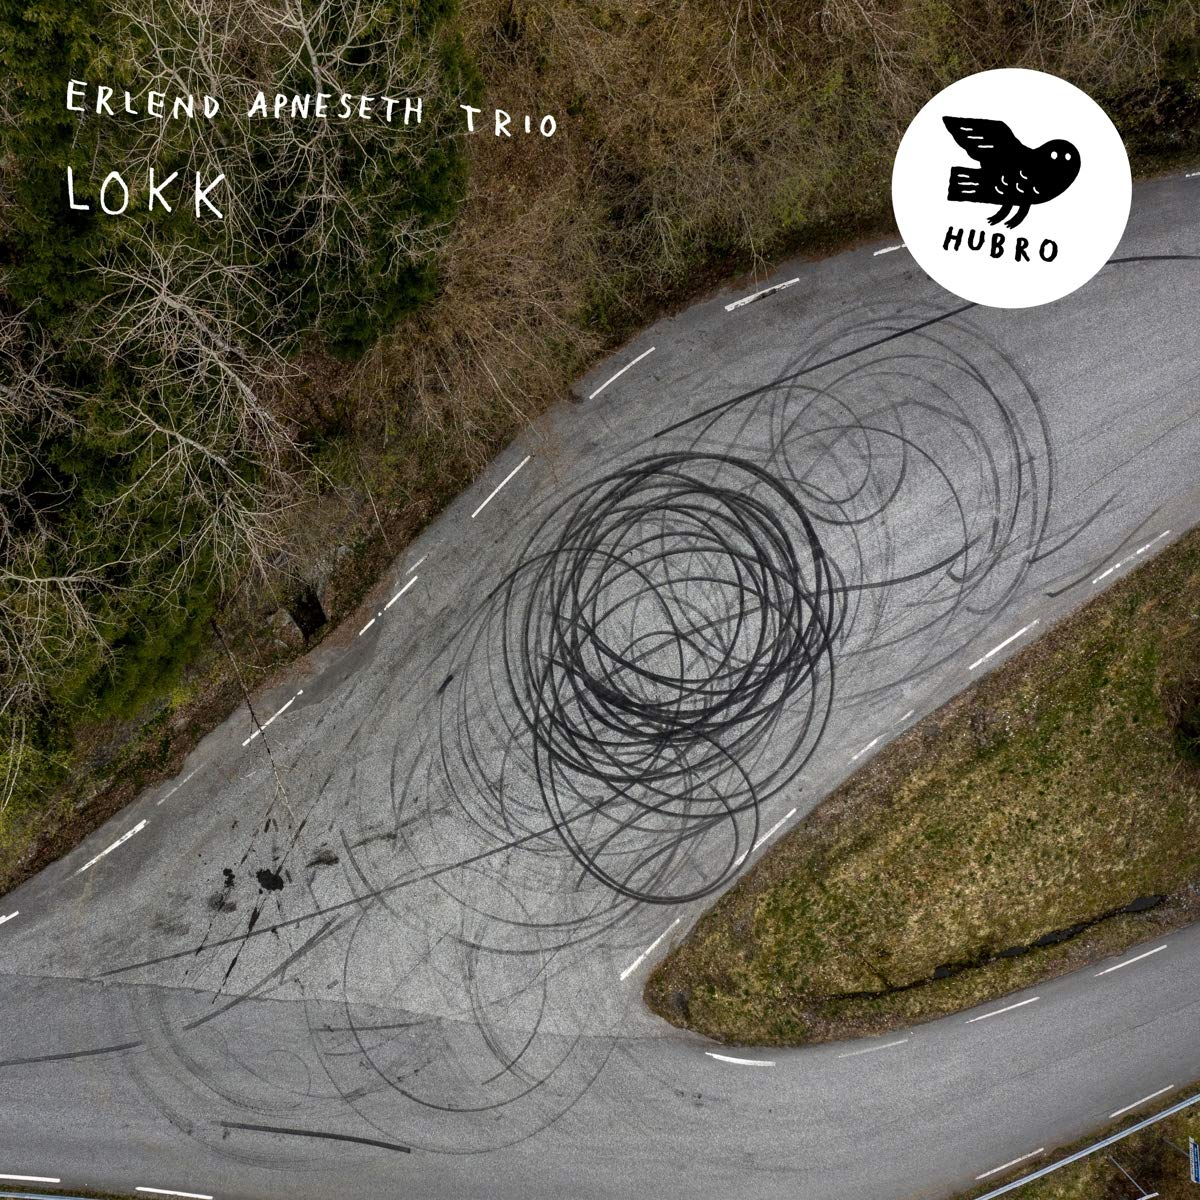 ERLEND APNESETH - Erlend Apneseth Trio : Lokk cover